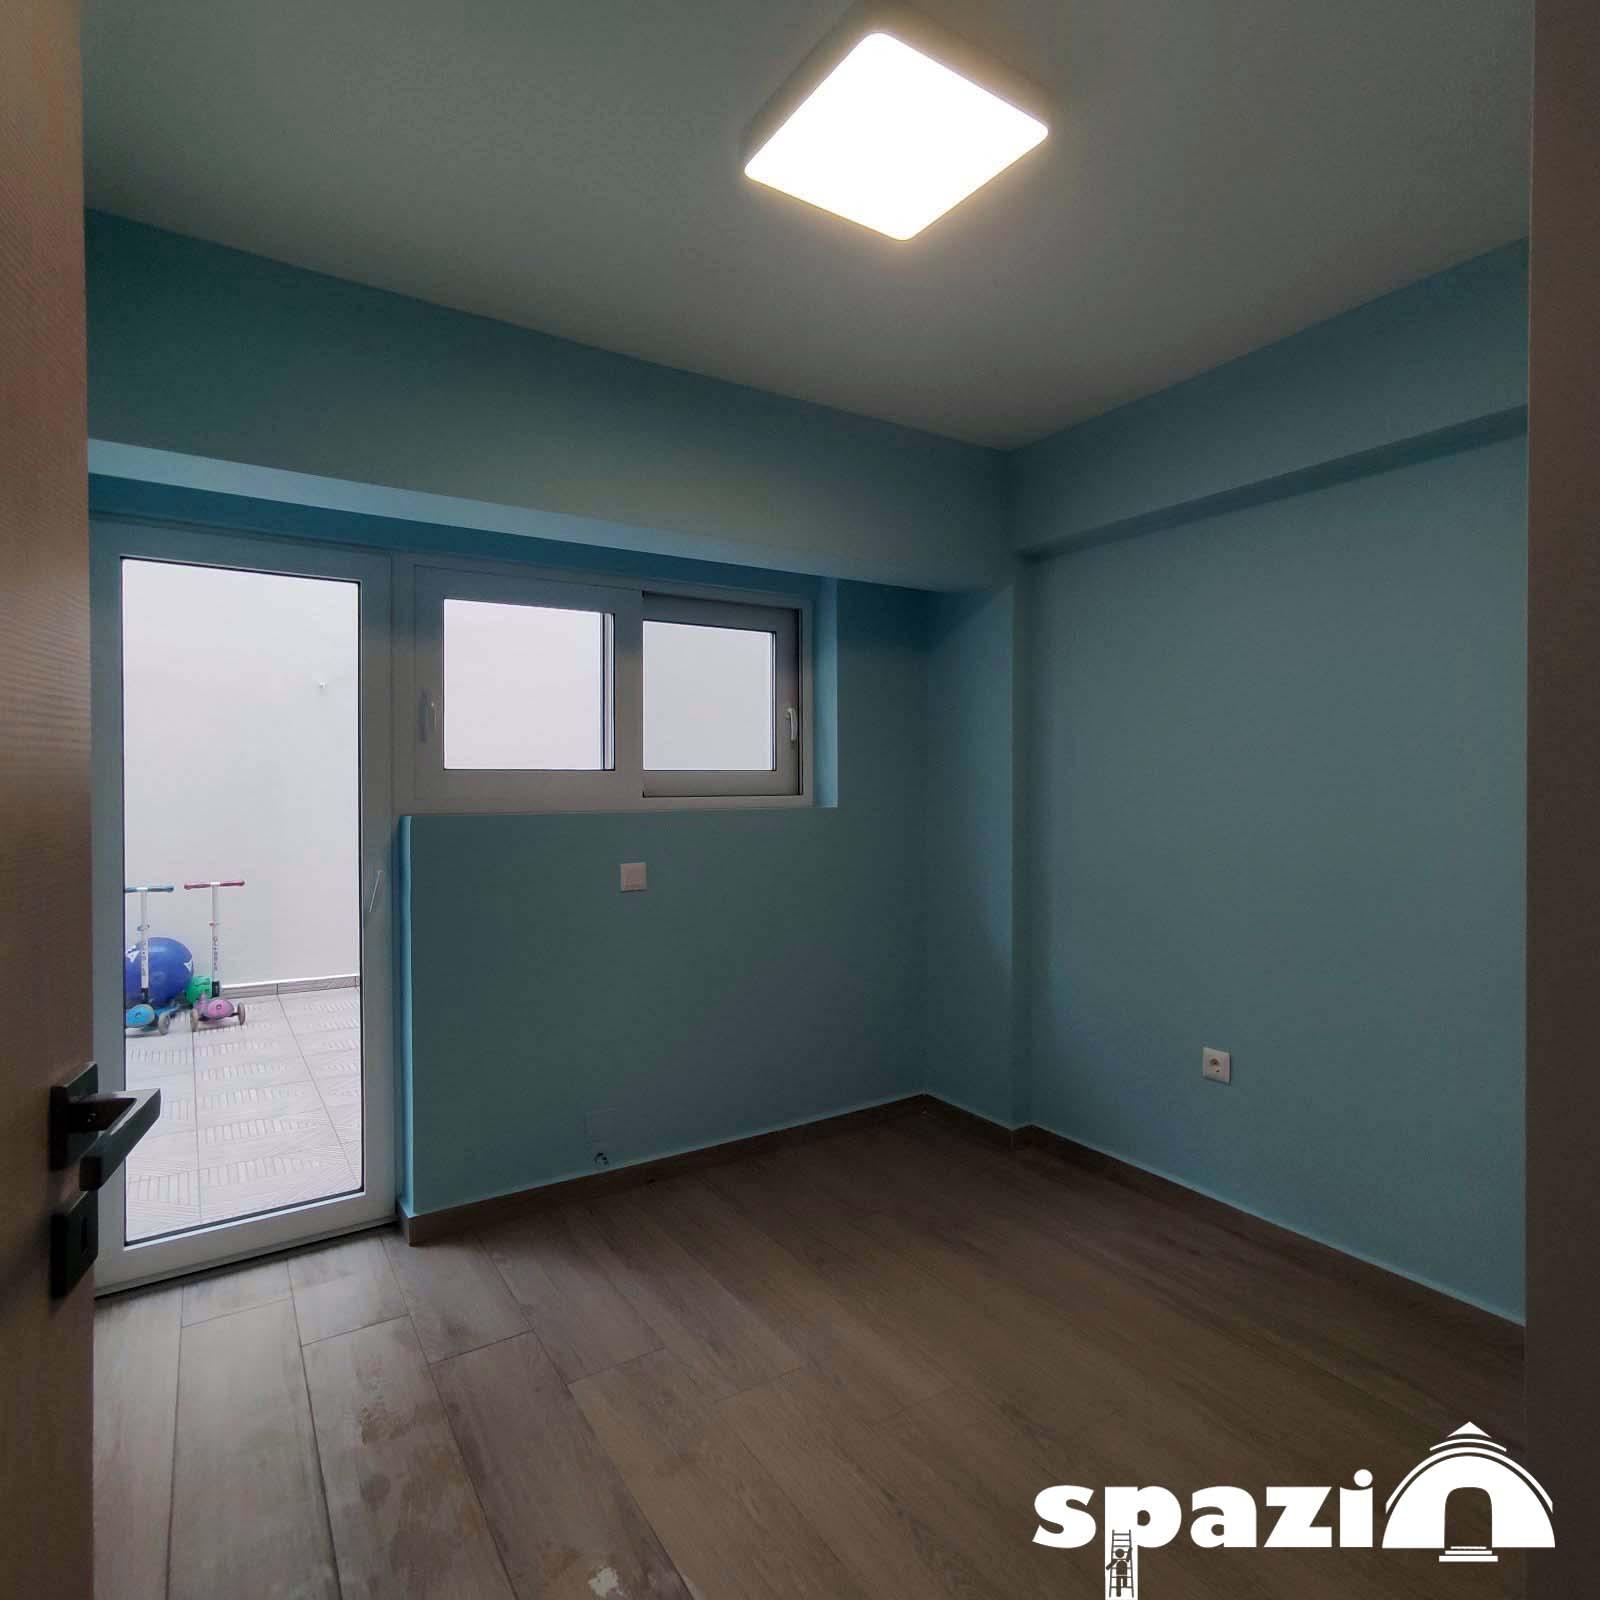 017_spazio_kastella.jpg